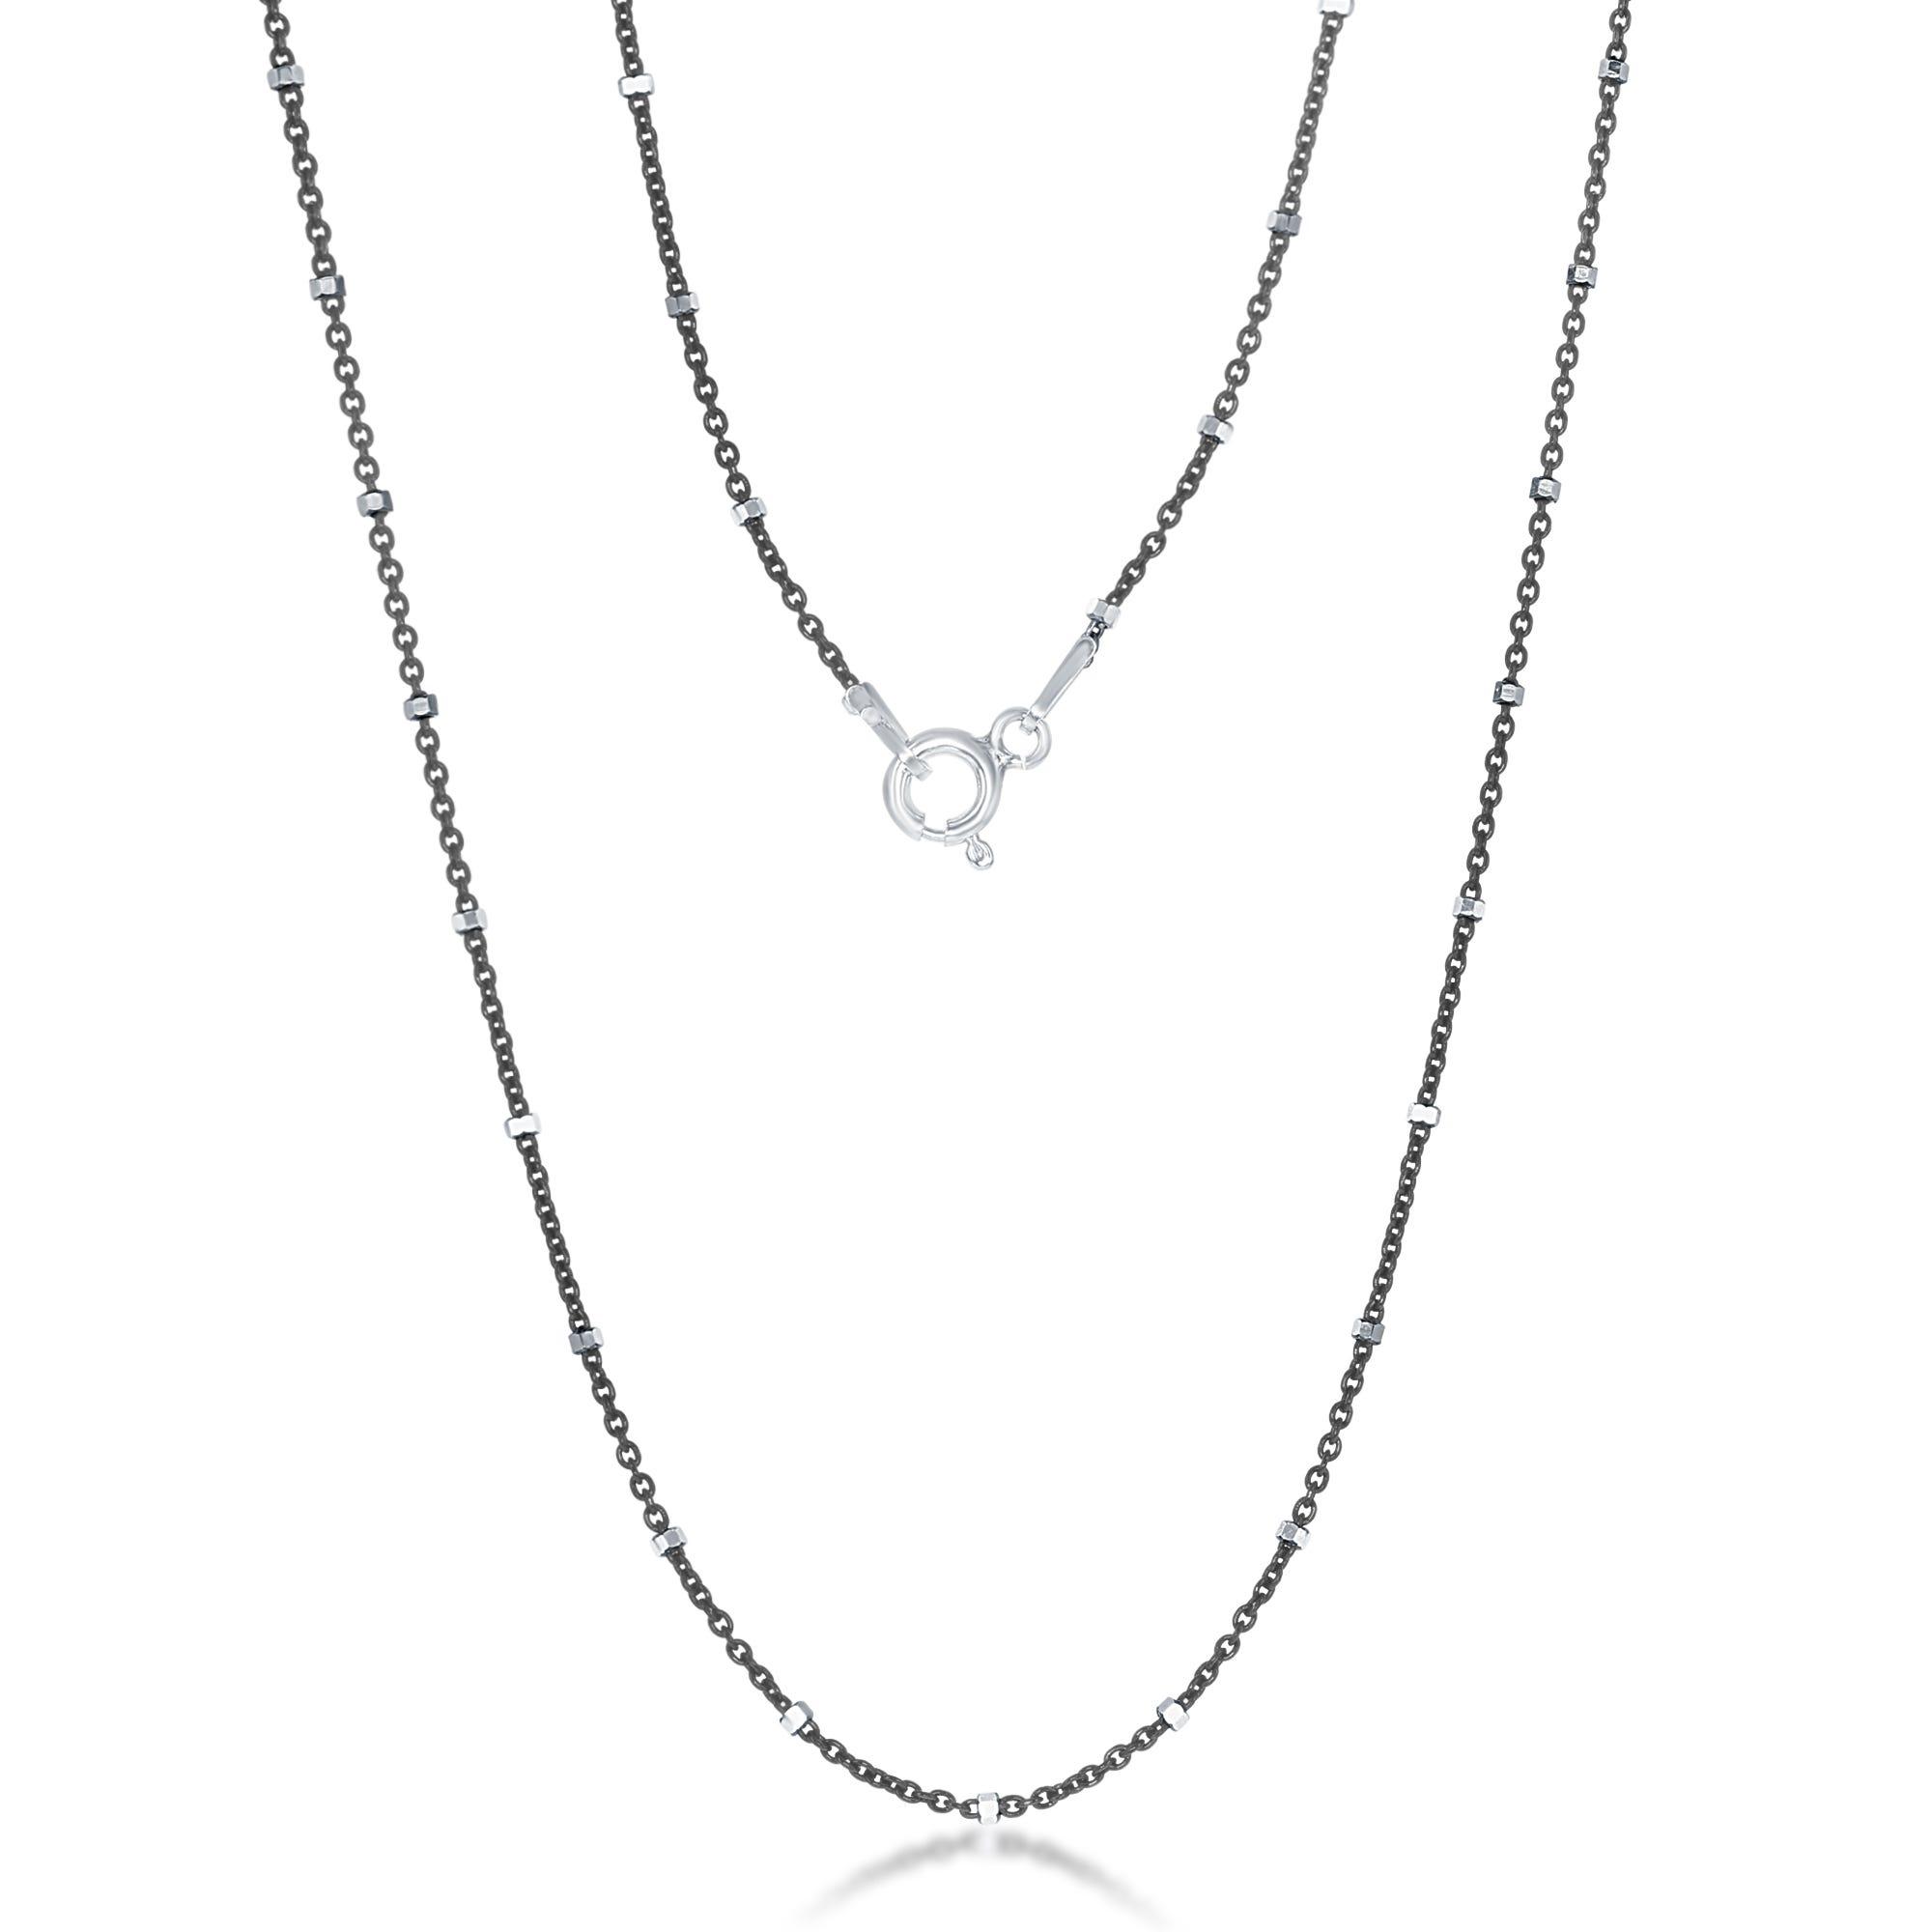 Black Rhodium Diamond Cut Station Chain 24